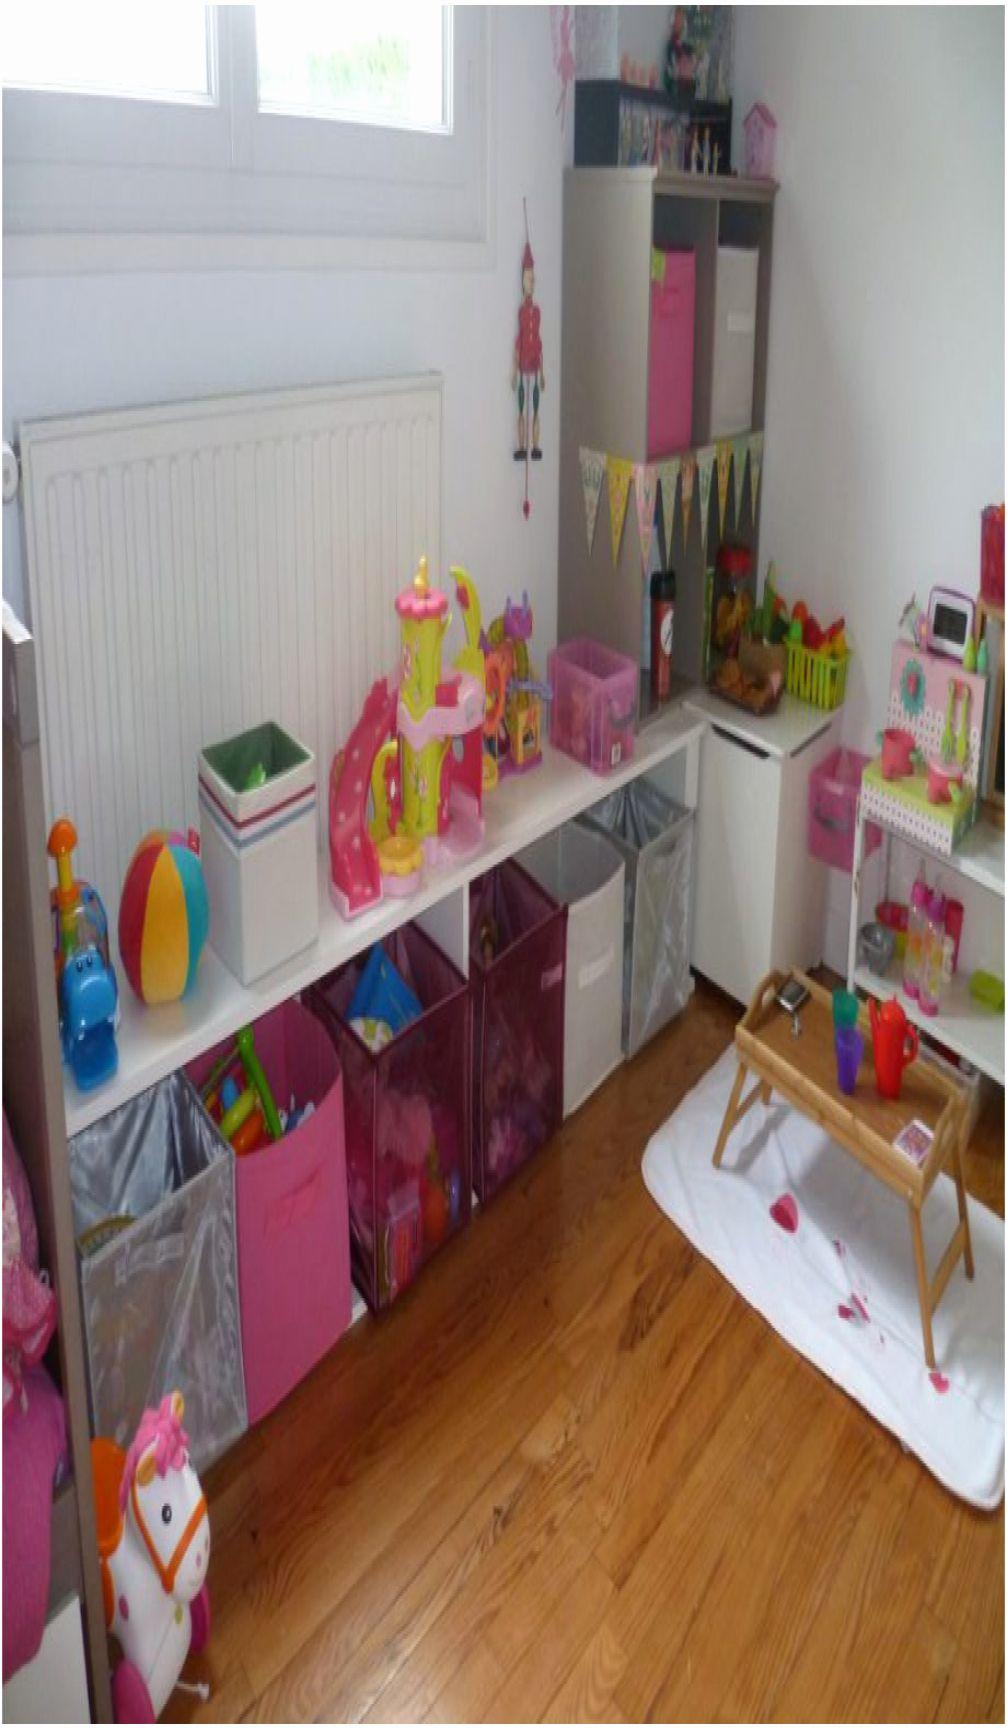 Ikea Rangement Enfant source Dinspiration Rangement Ikea Chambre D Enfant | Ikea rangement ...